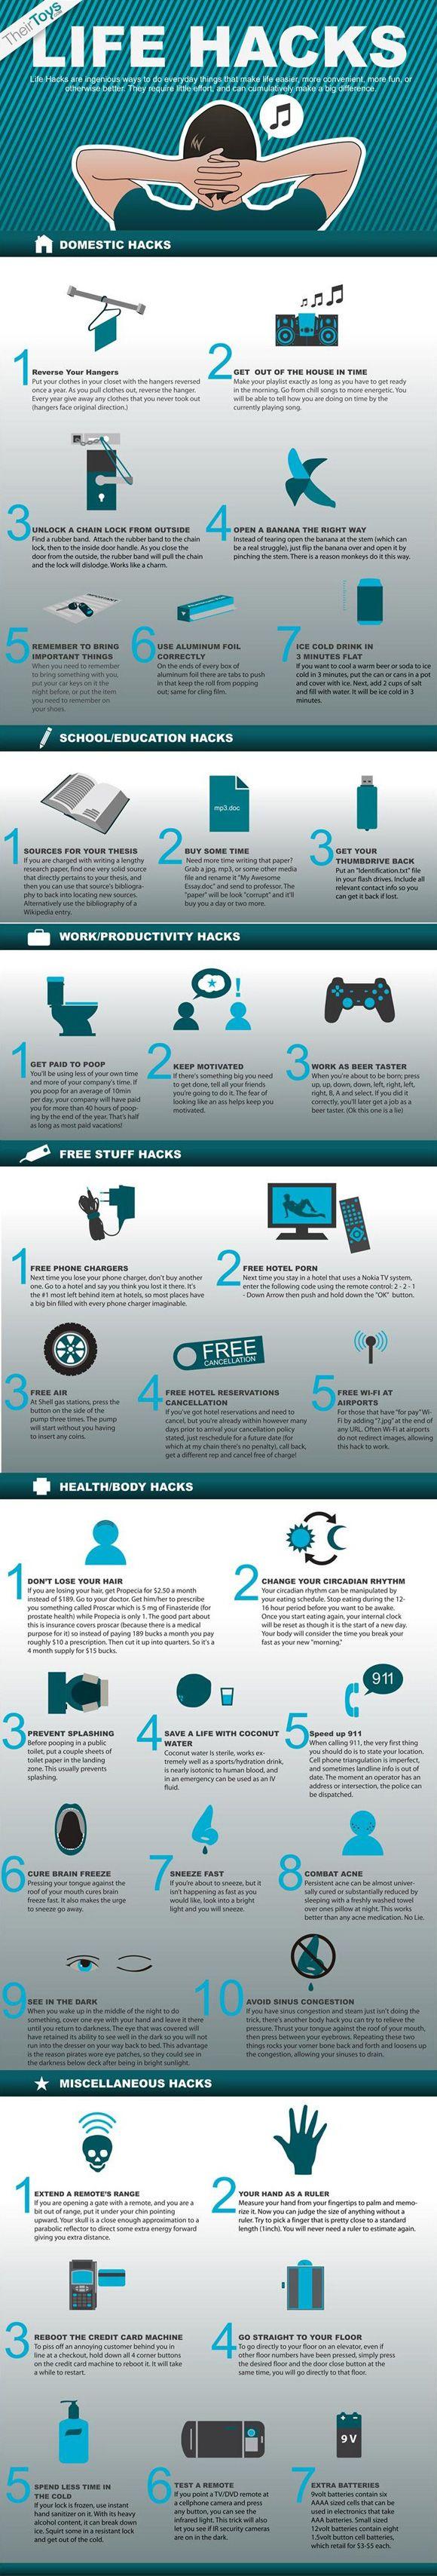 Life Hacks: Make Life Easier, Used Life Hacks, Real Life, Website, Web Site, Internet Site, Life Tips, Lifehacks, Life Cheat